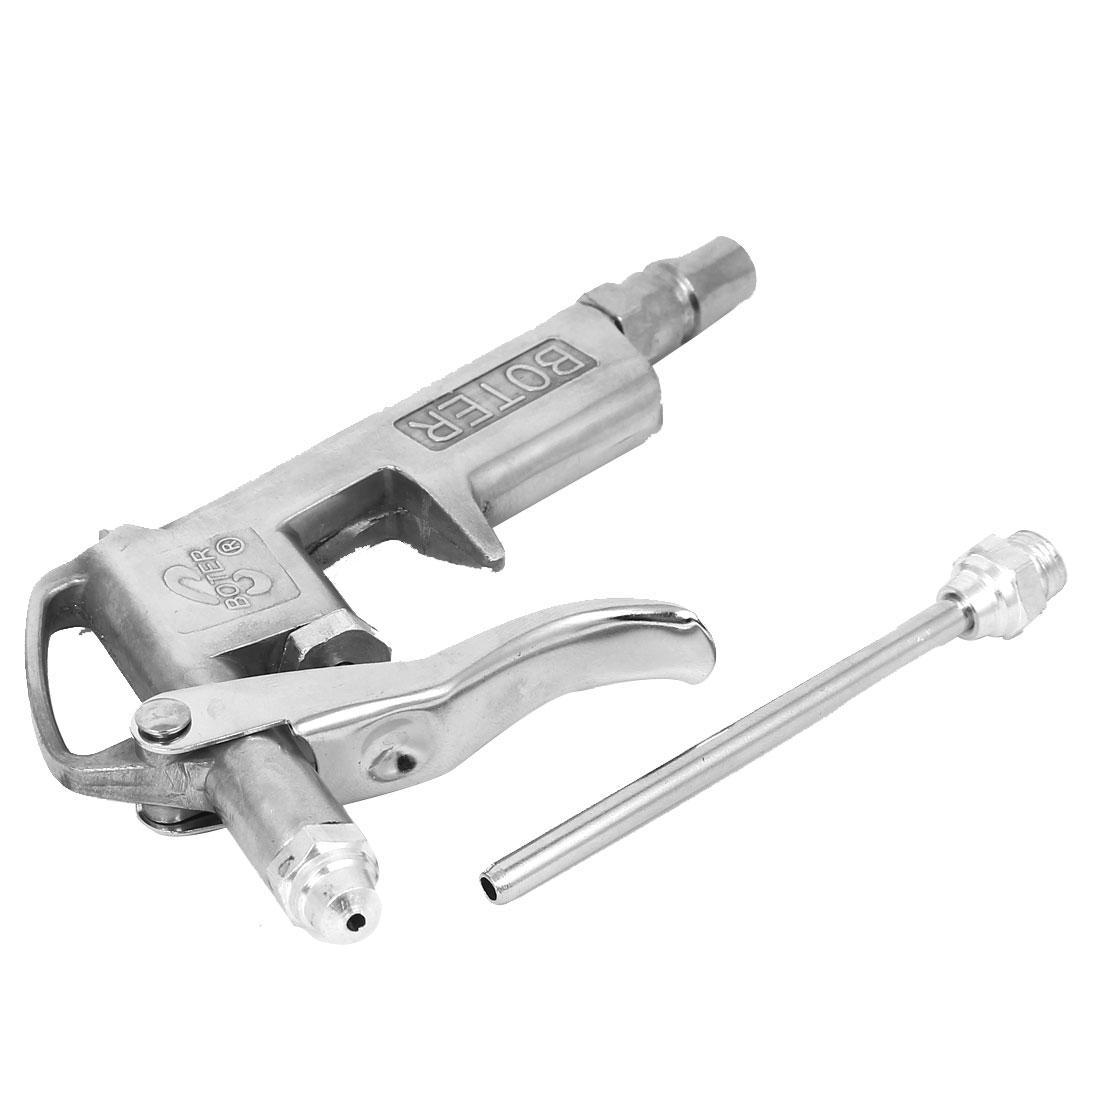 Metal Air Compressor Duster Blower Blow Gun Cleaner Tool Silver Tone